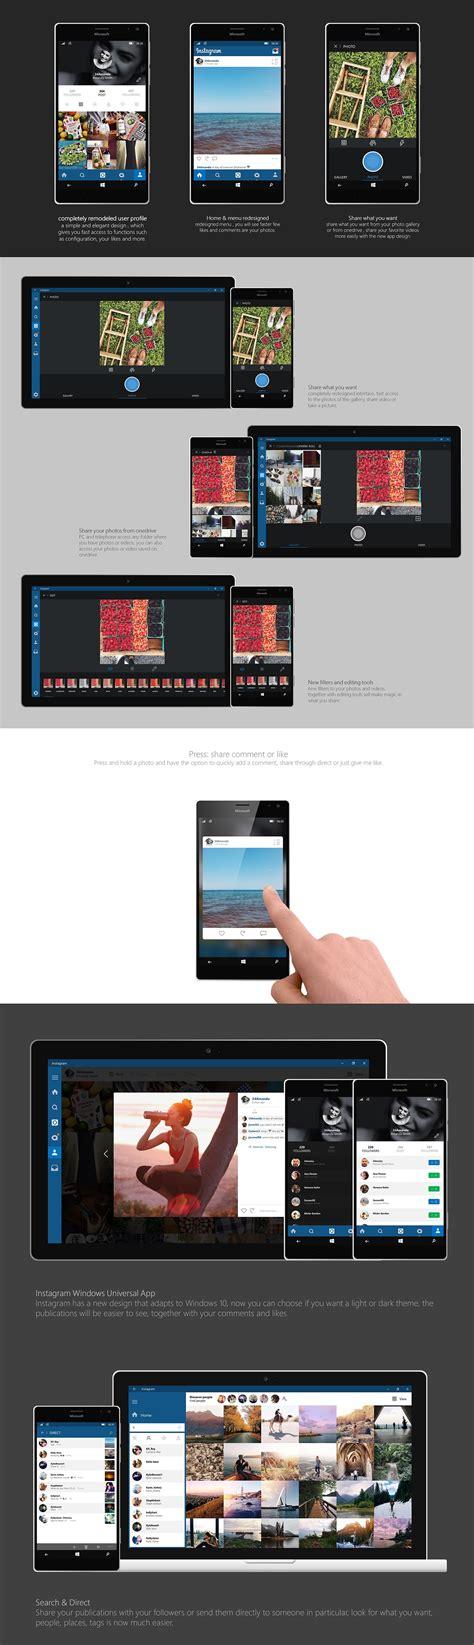 graphic design instagram app instagram universal app for windows 10 on behance